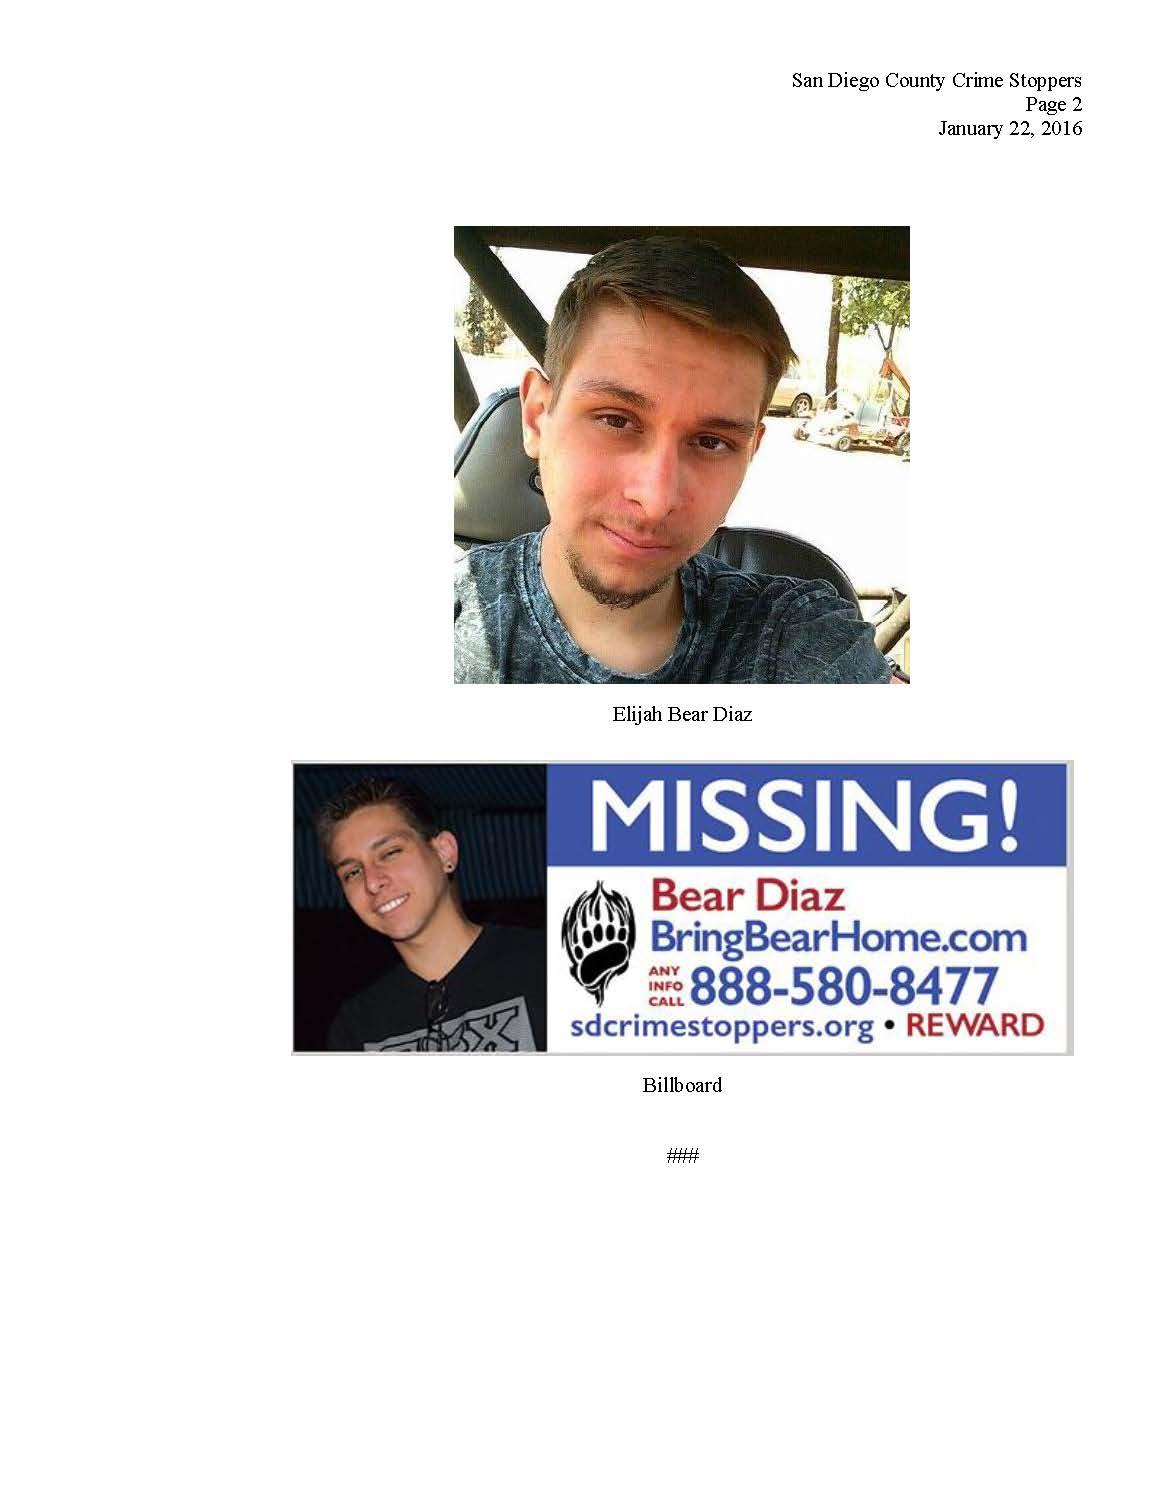 012216 Elijah Bear Diaz1 (2)_Page_2